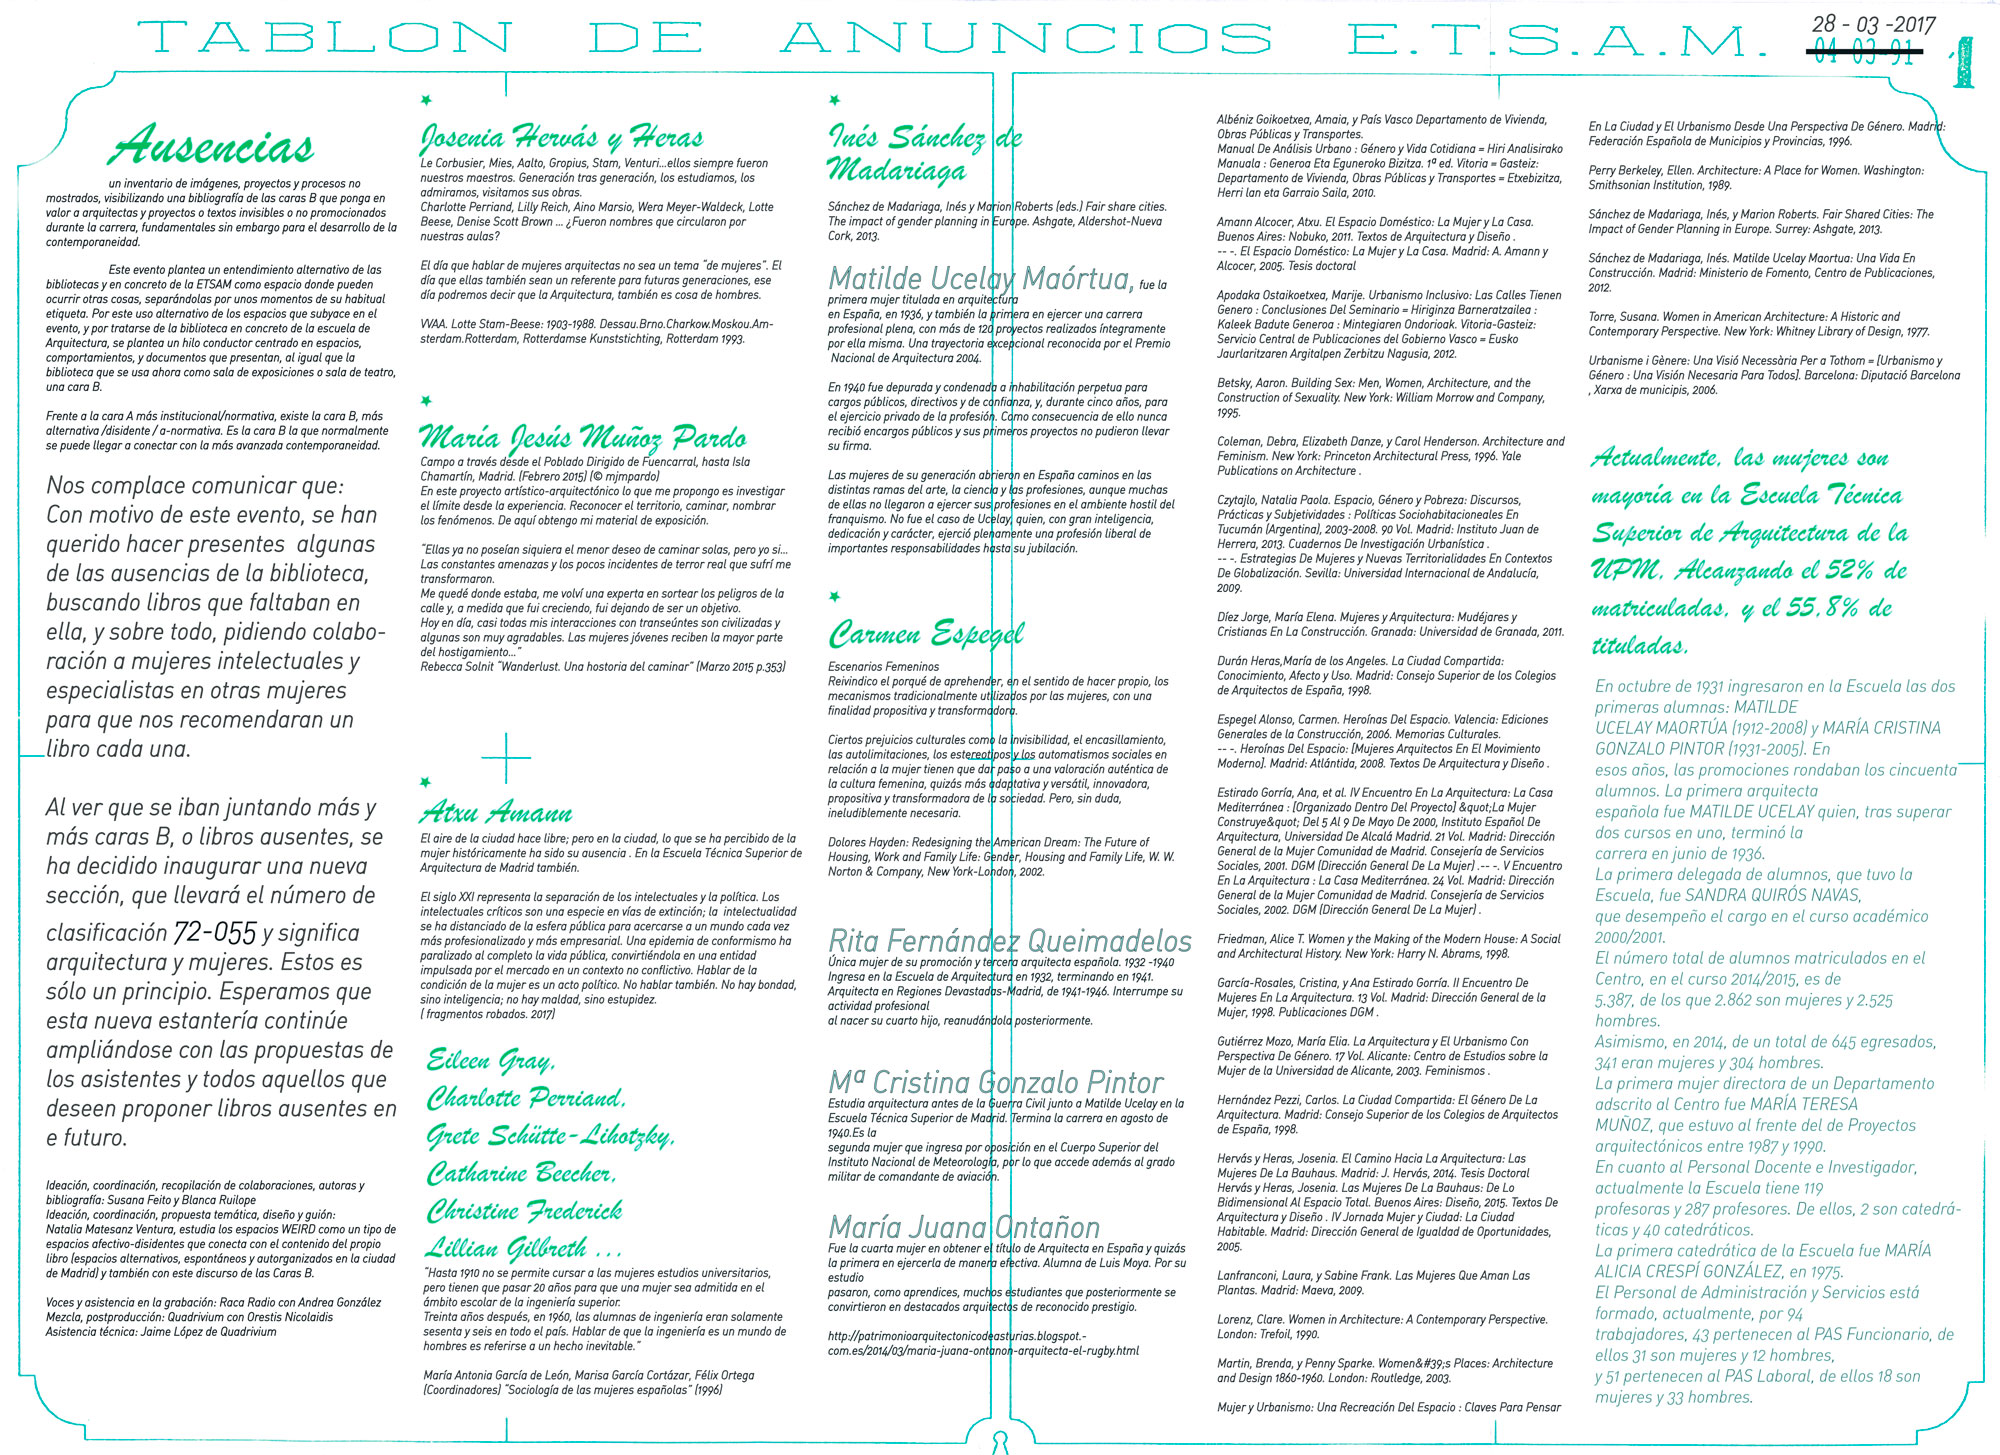 folleto-definitivo-jane-jacobs-cumulolimbo-natalie-mv